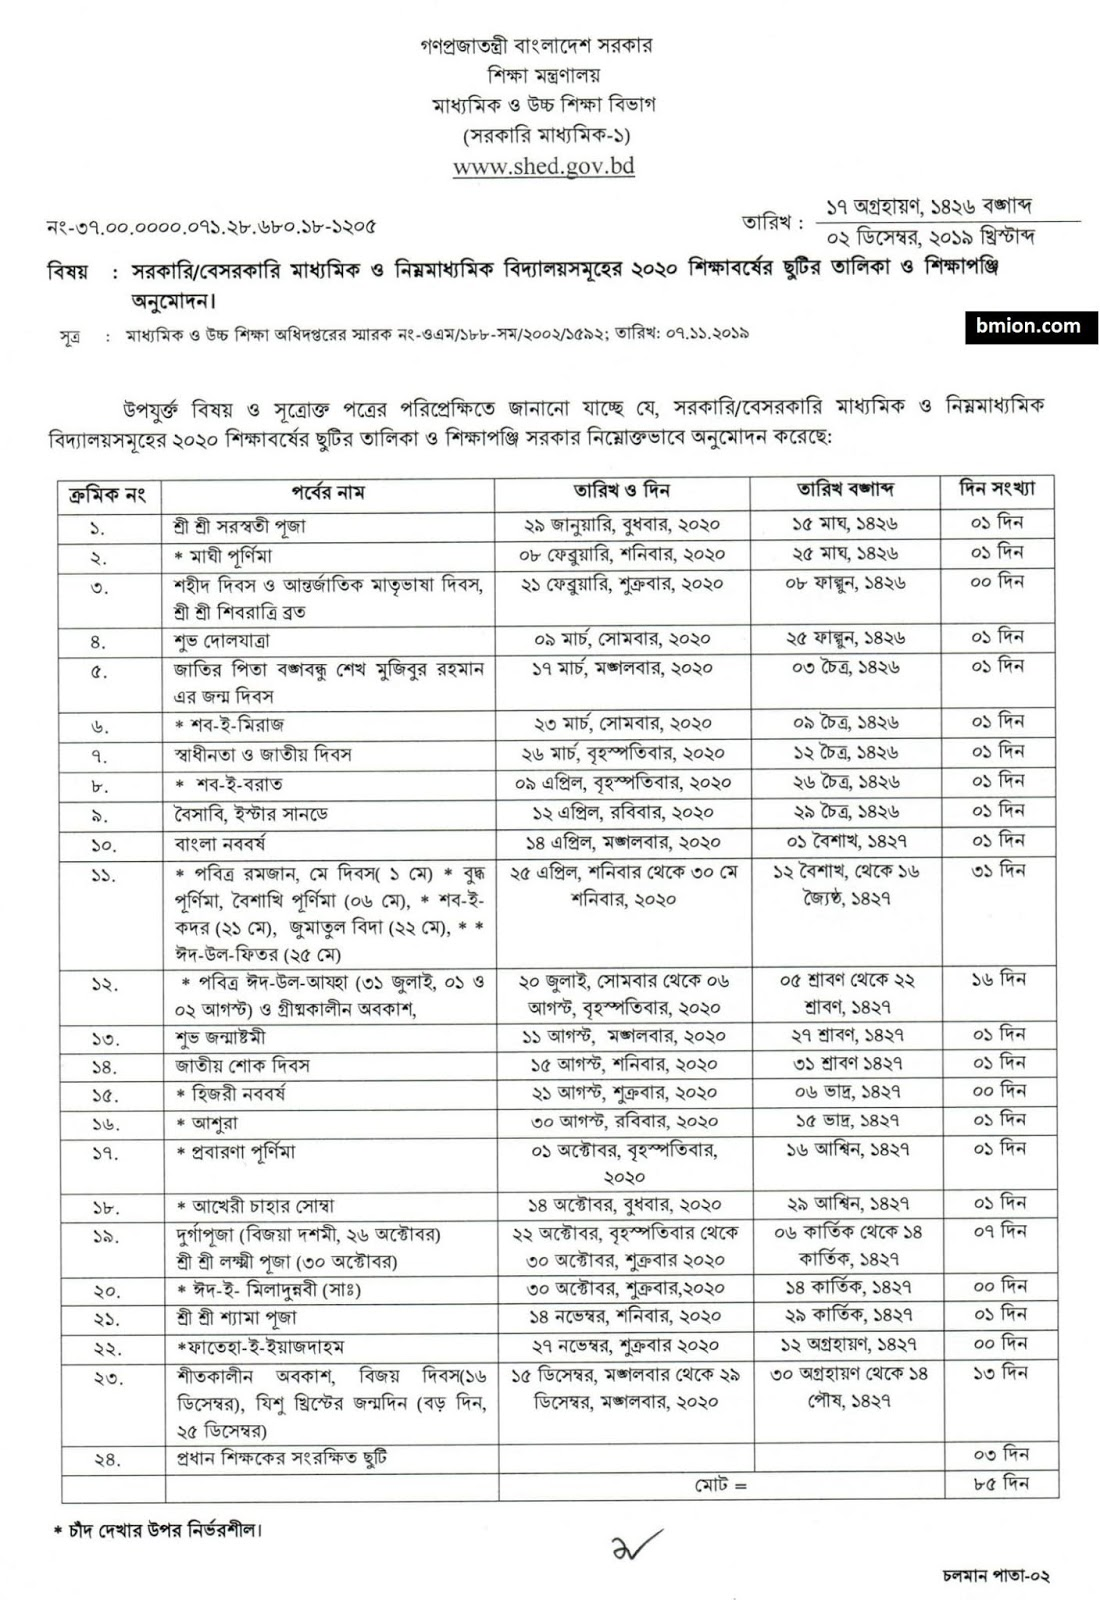 Bangladesh-School-Holidays-2020-College-Holidays-2020-Academic-Calendar-2020